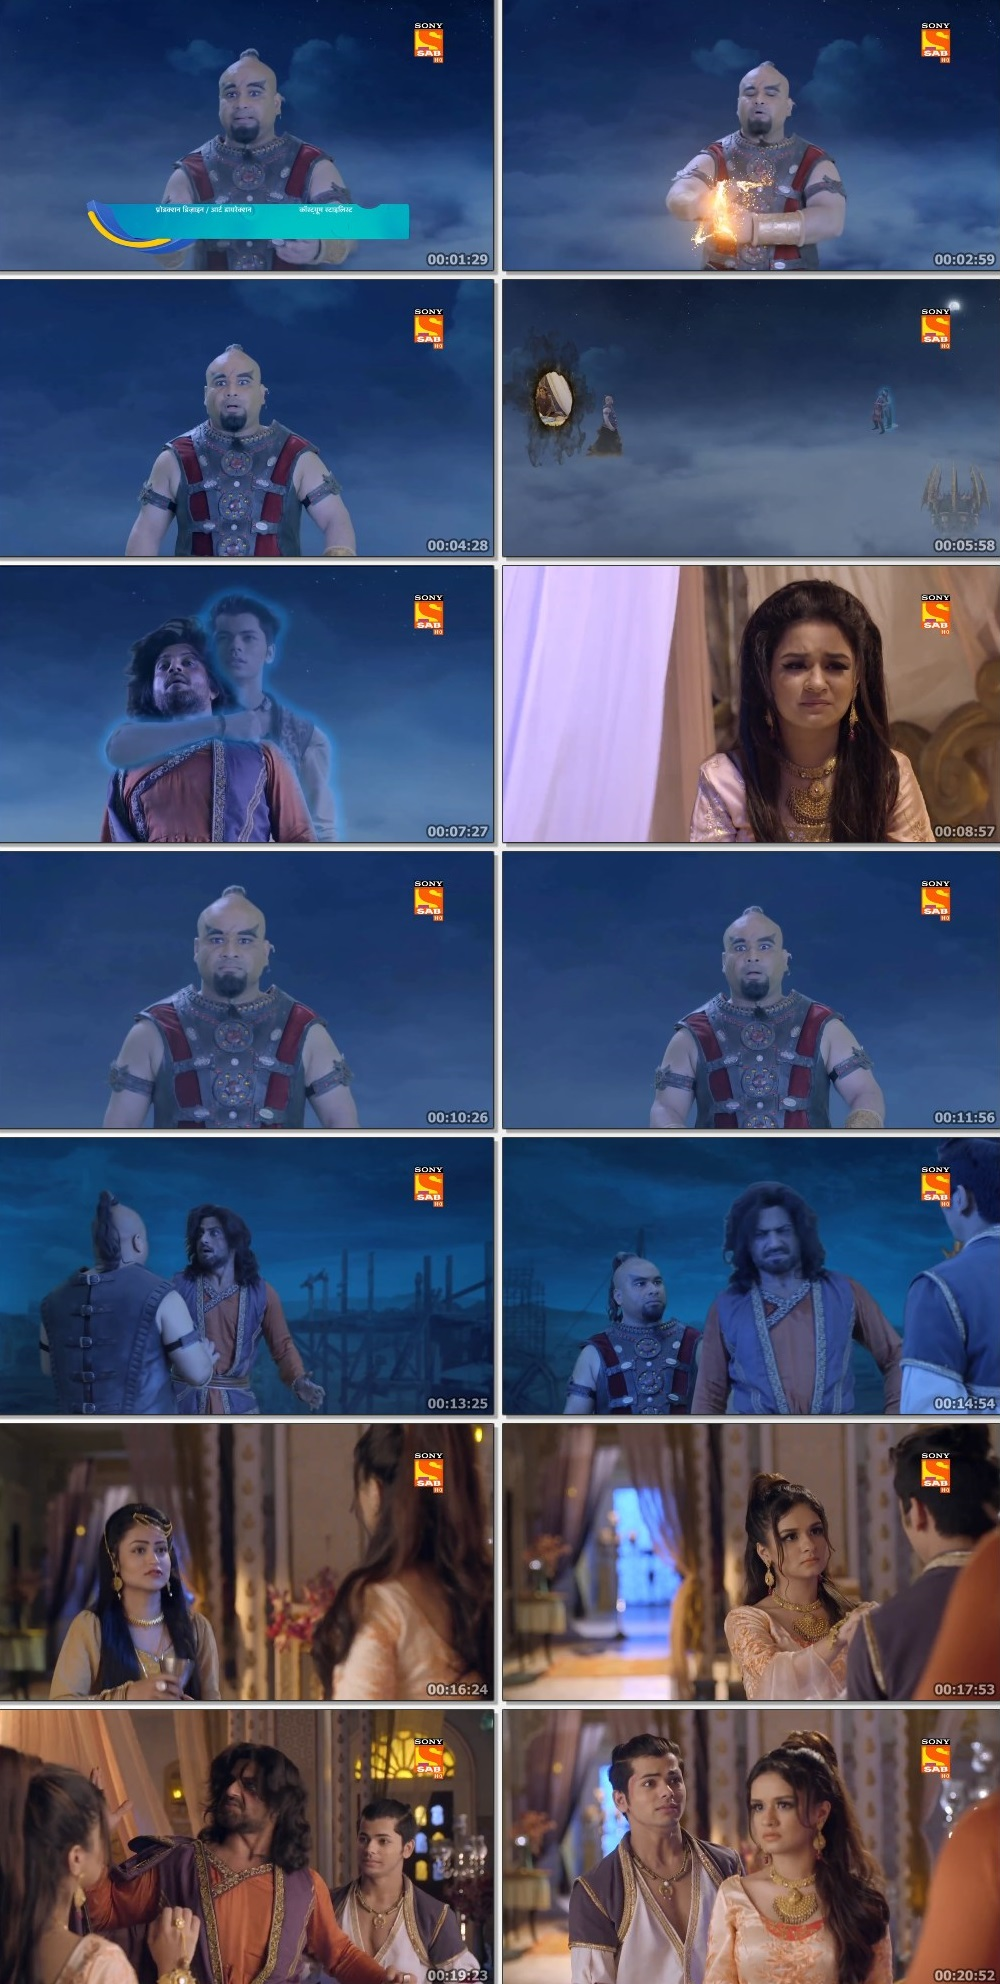 Watch Online Aladdin 2019 Episode 276 Full Free Download 720P HD